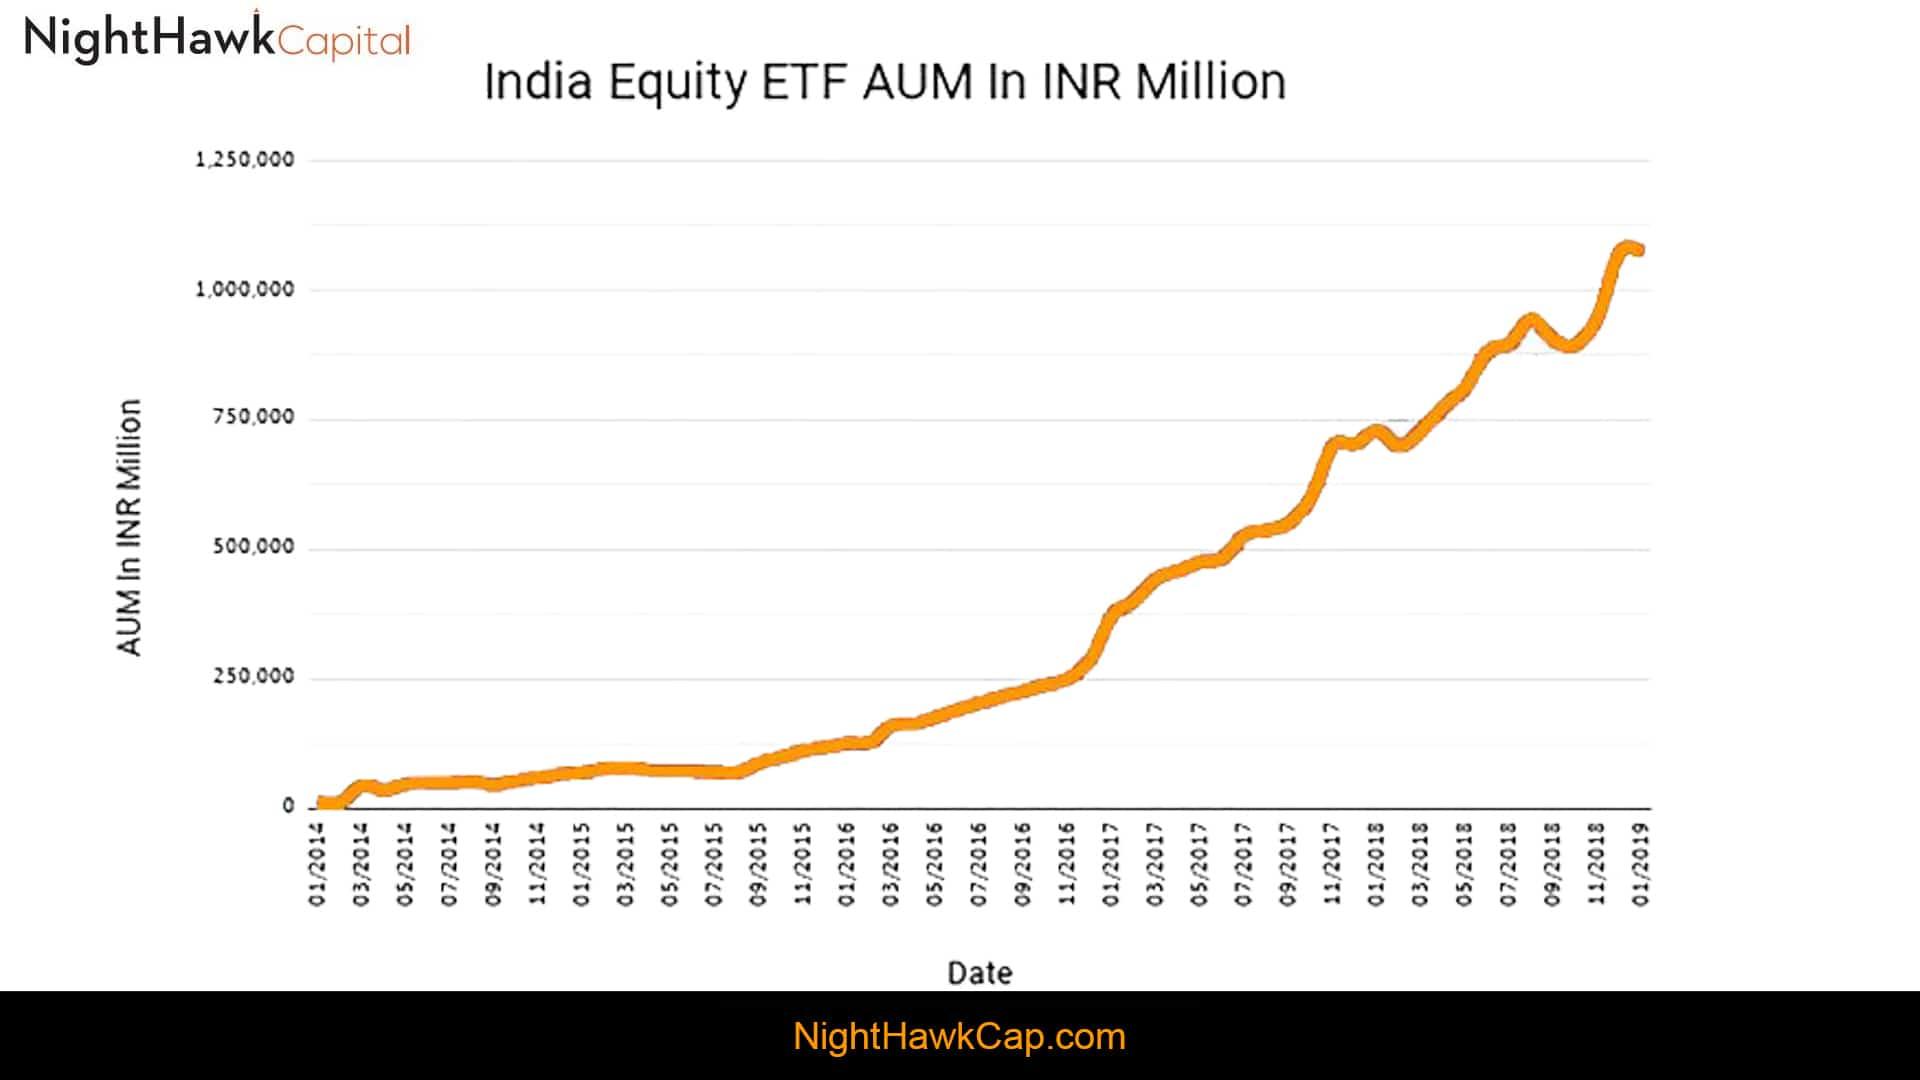 India Equity ETF